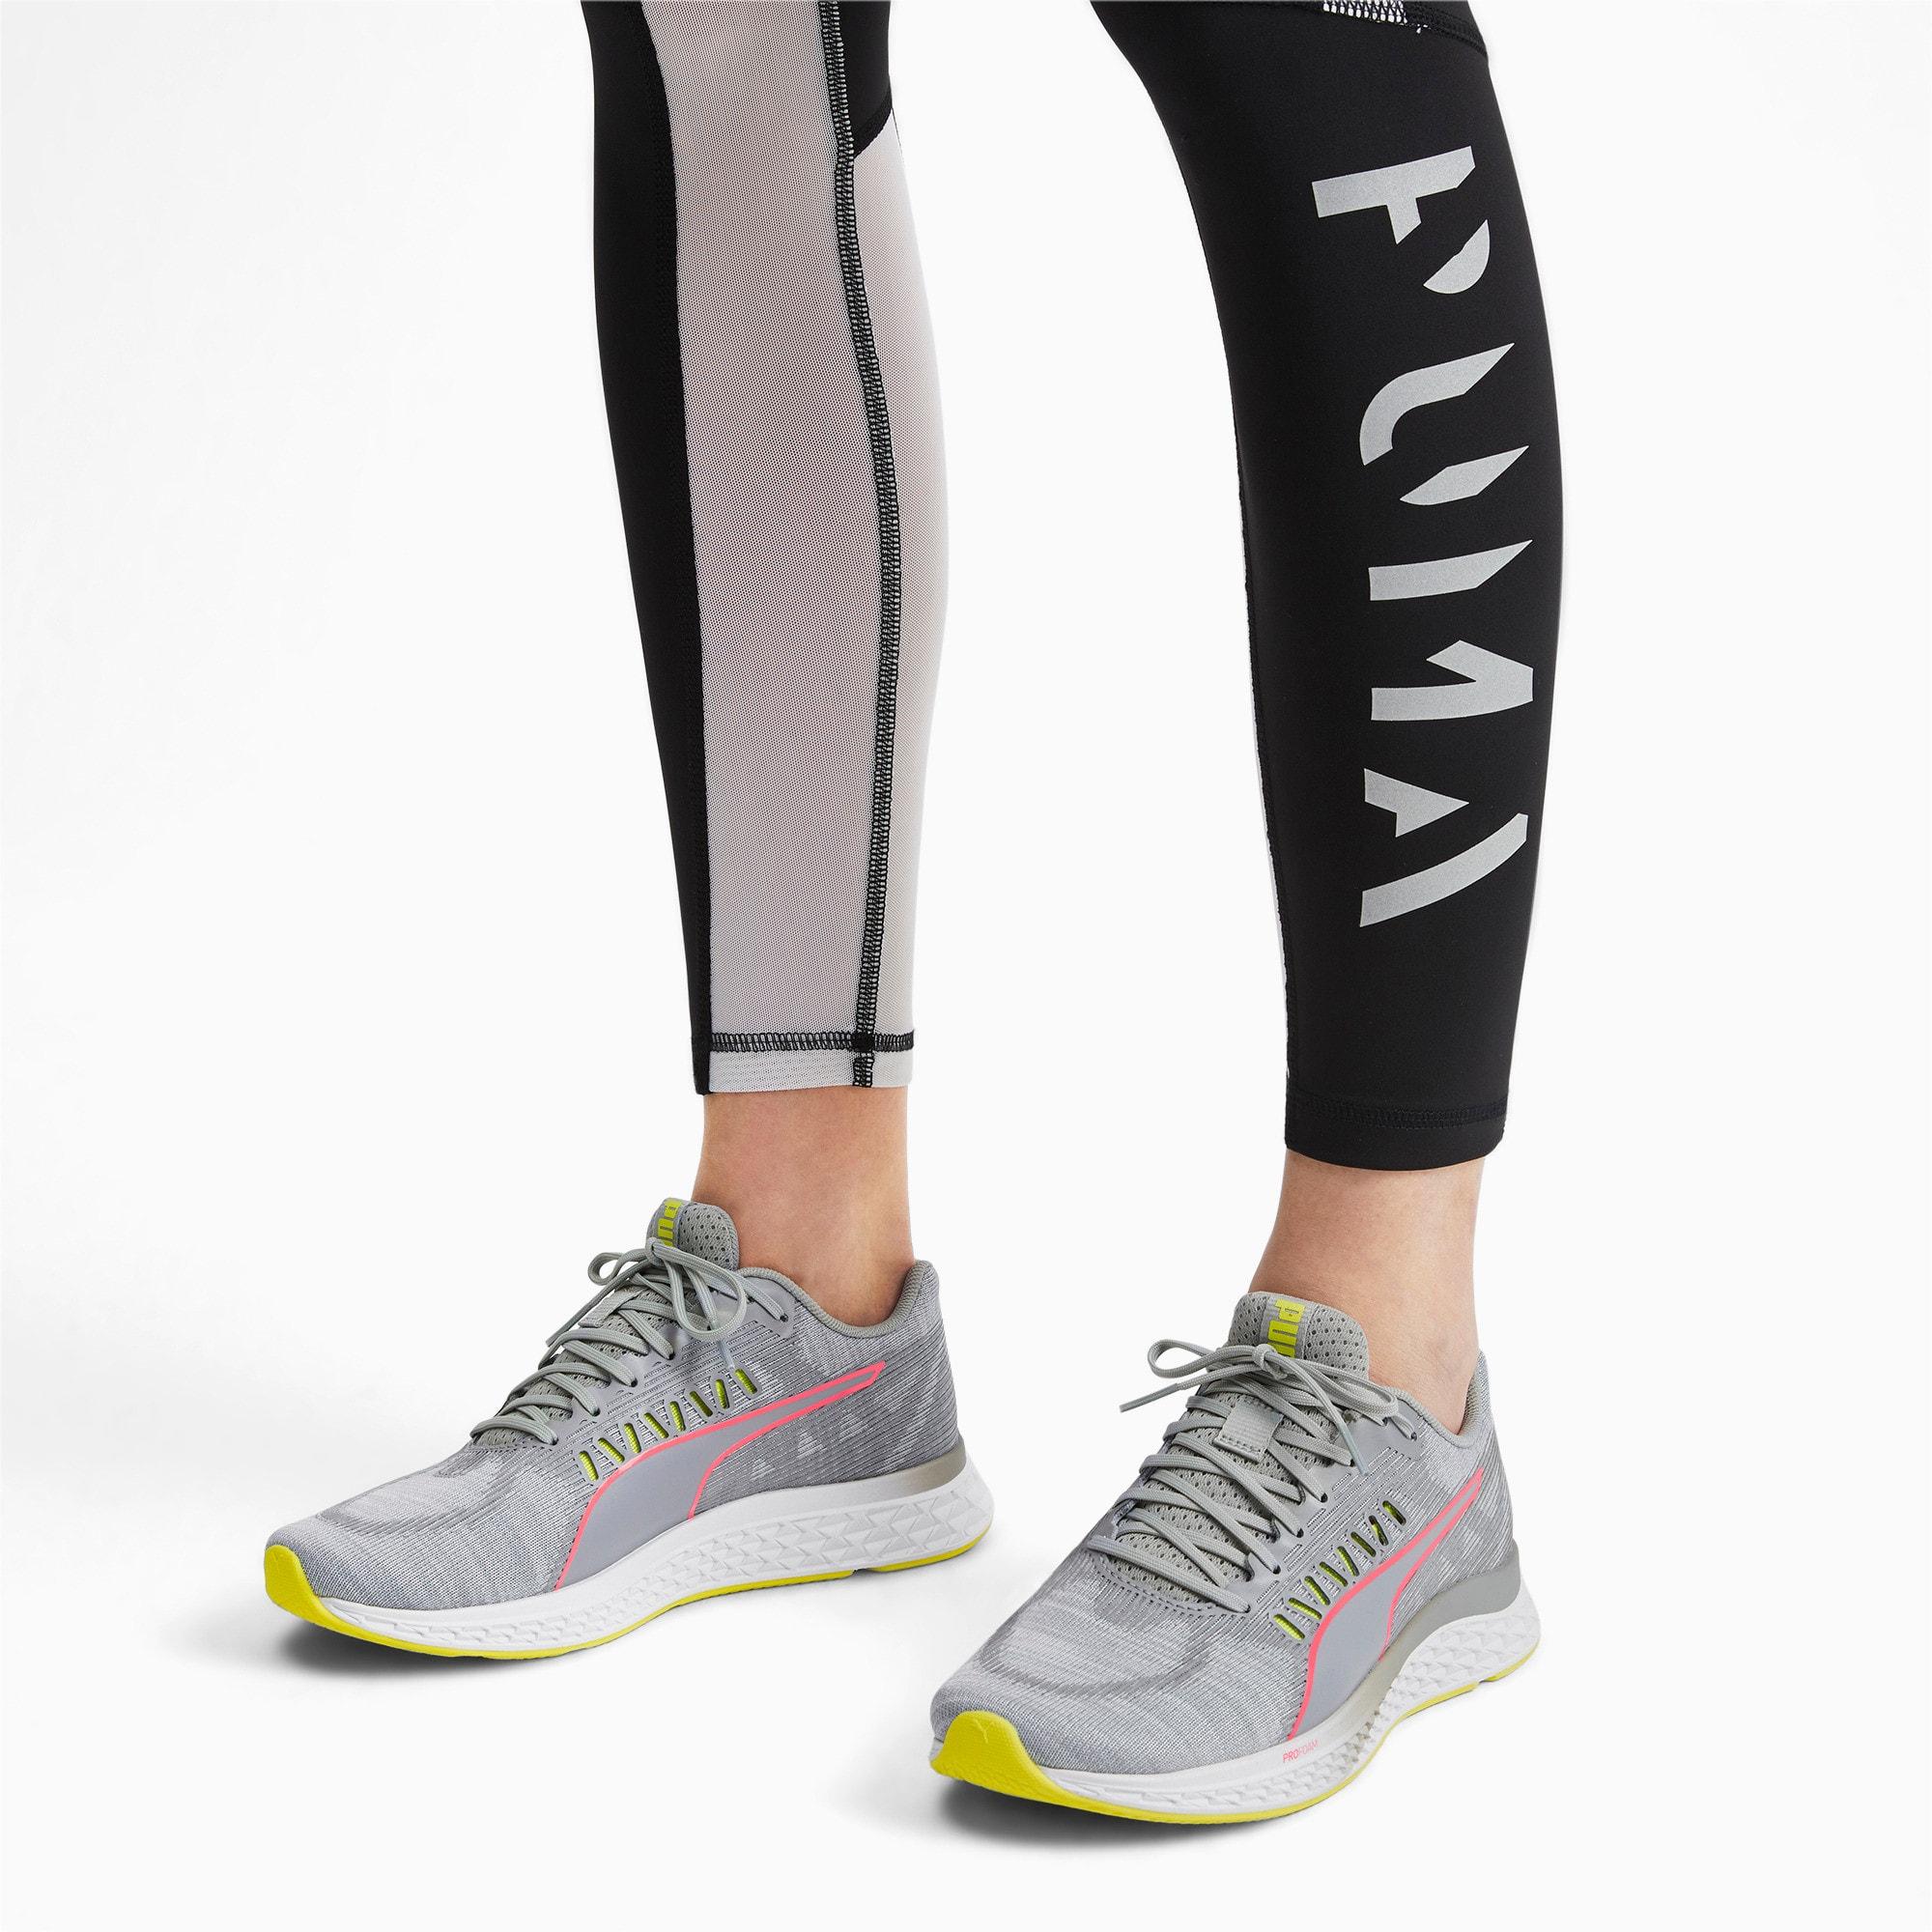 Imagen en miniatura 2 de Zapatillas de running de mujer Speed Sutamina, Quarry-Yellow Alert-Pink, mediana